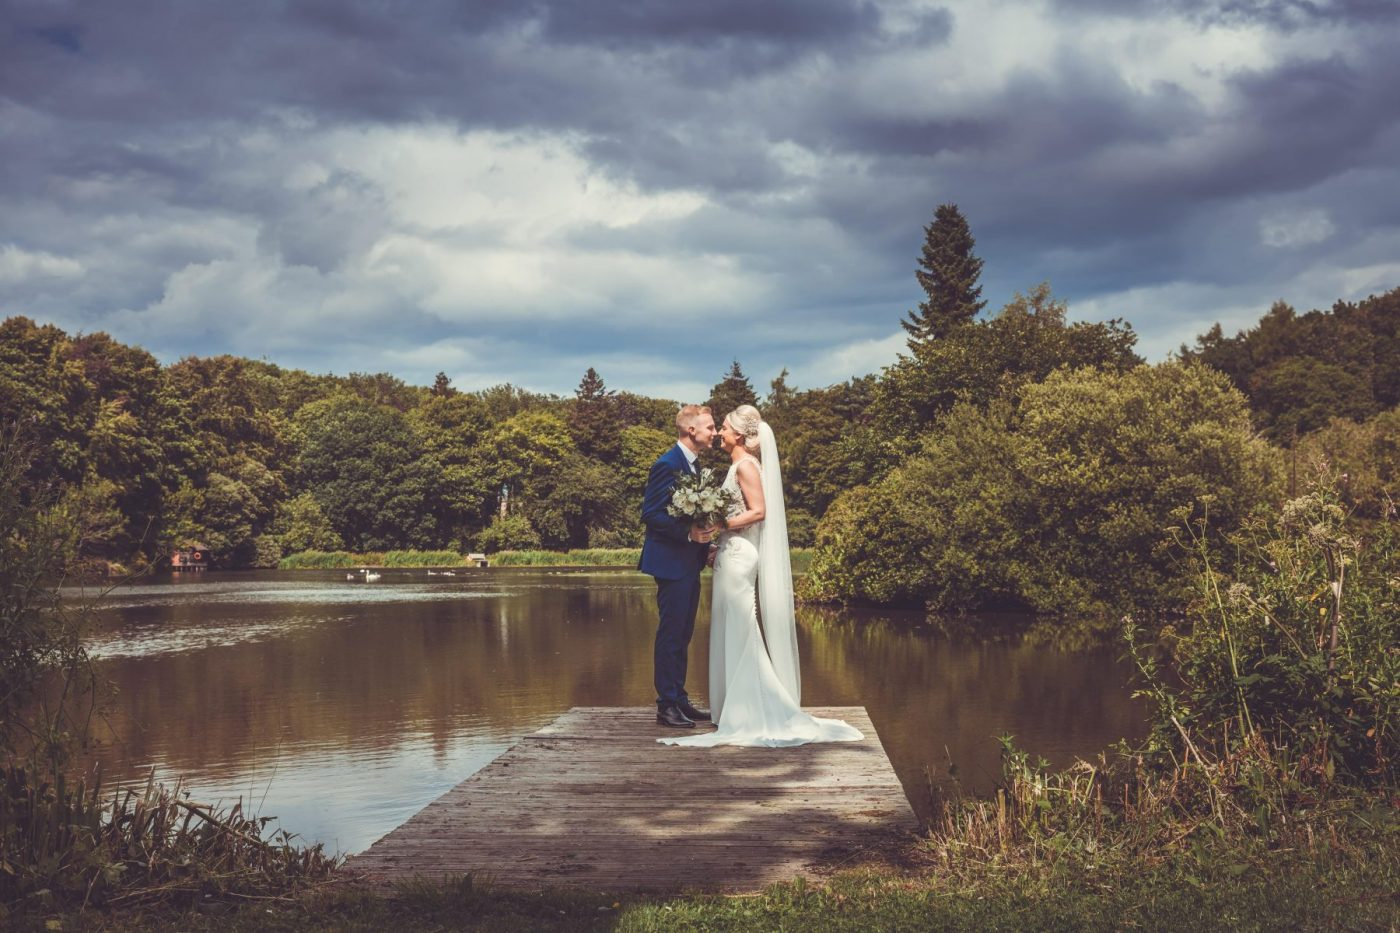 Doxford Barns Wedding Venue